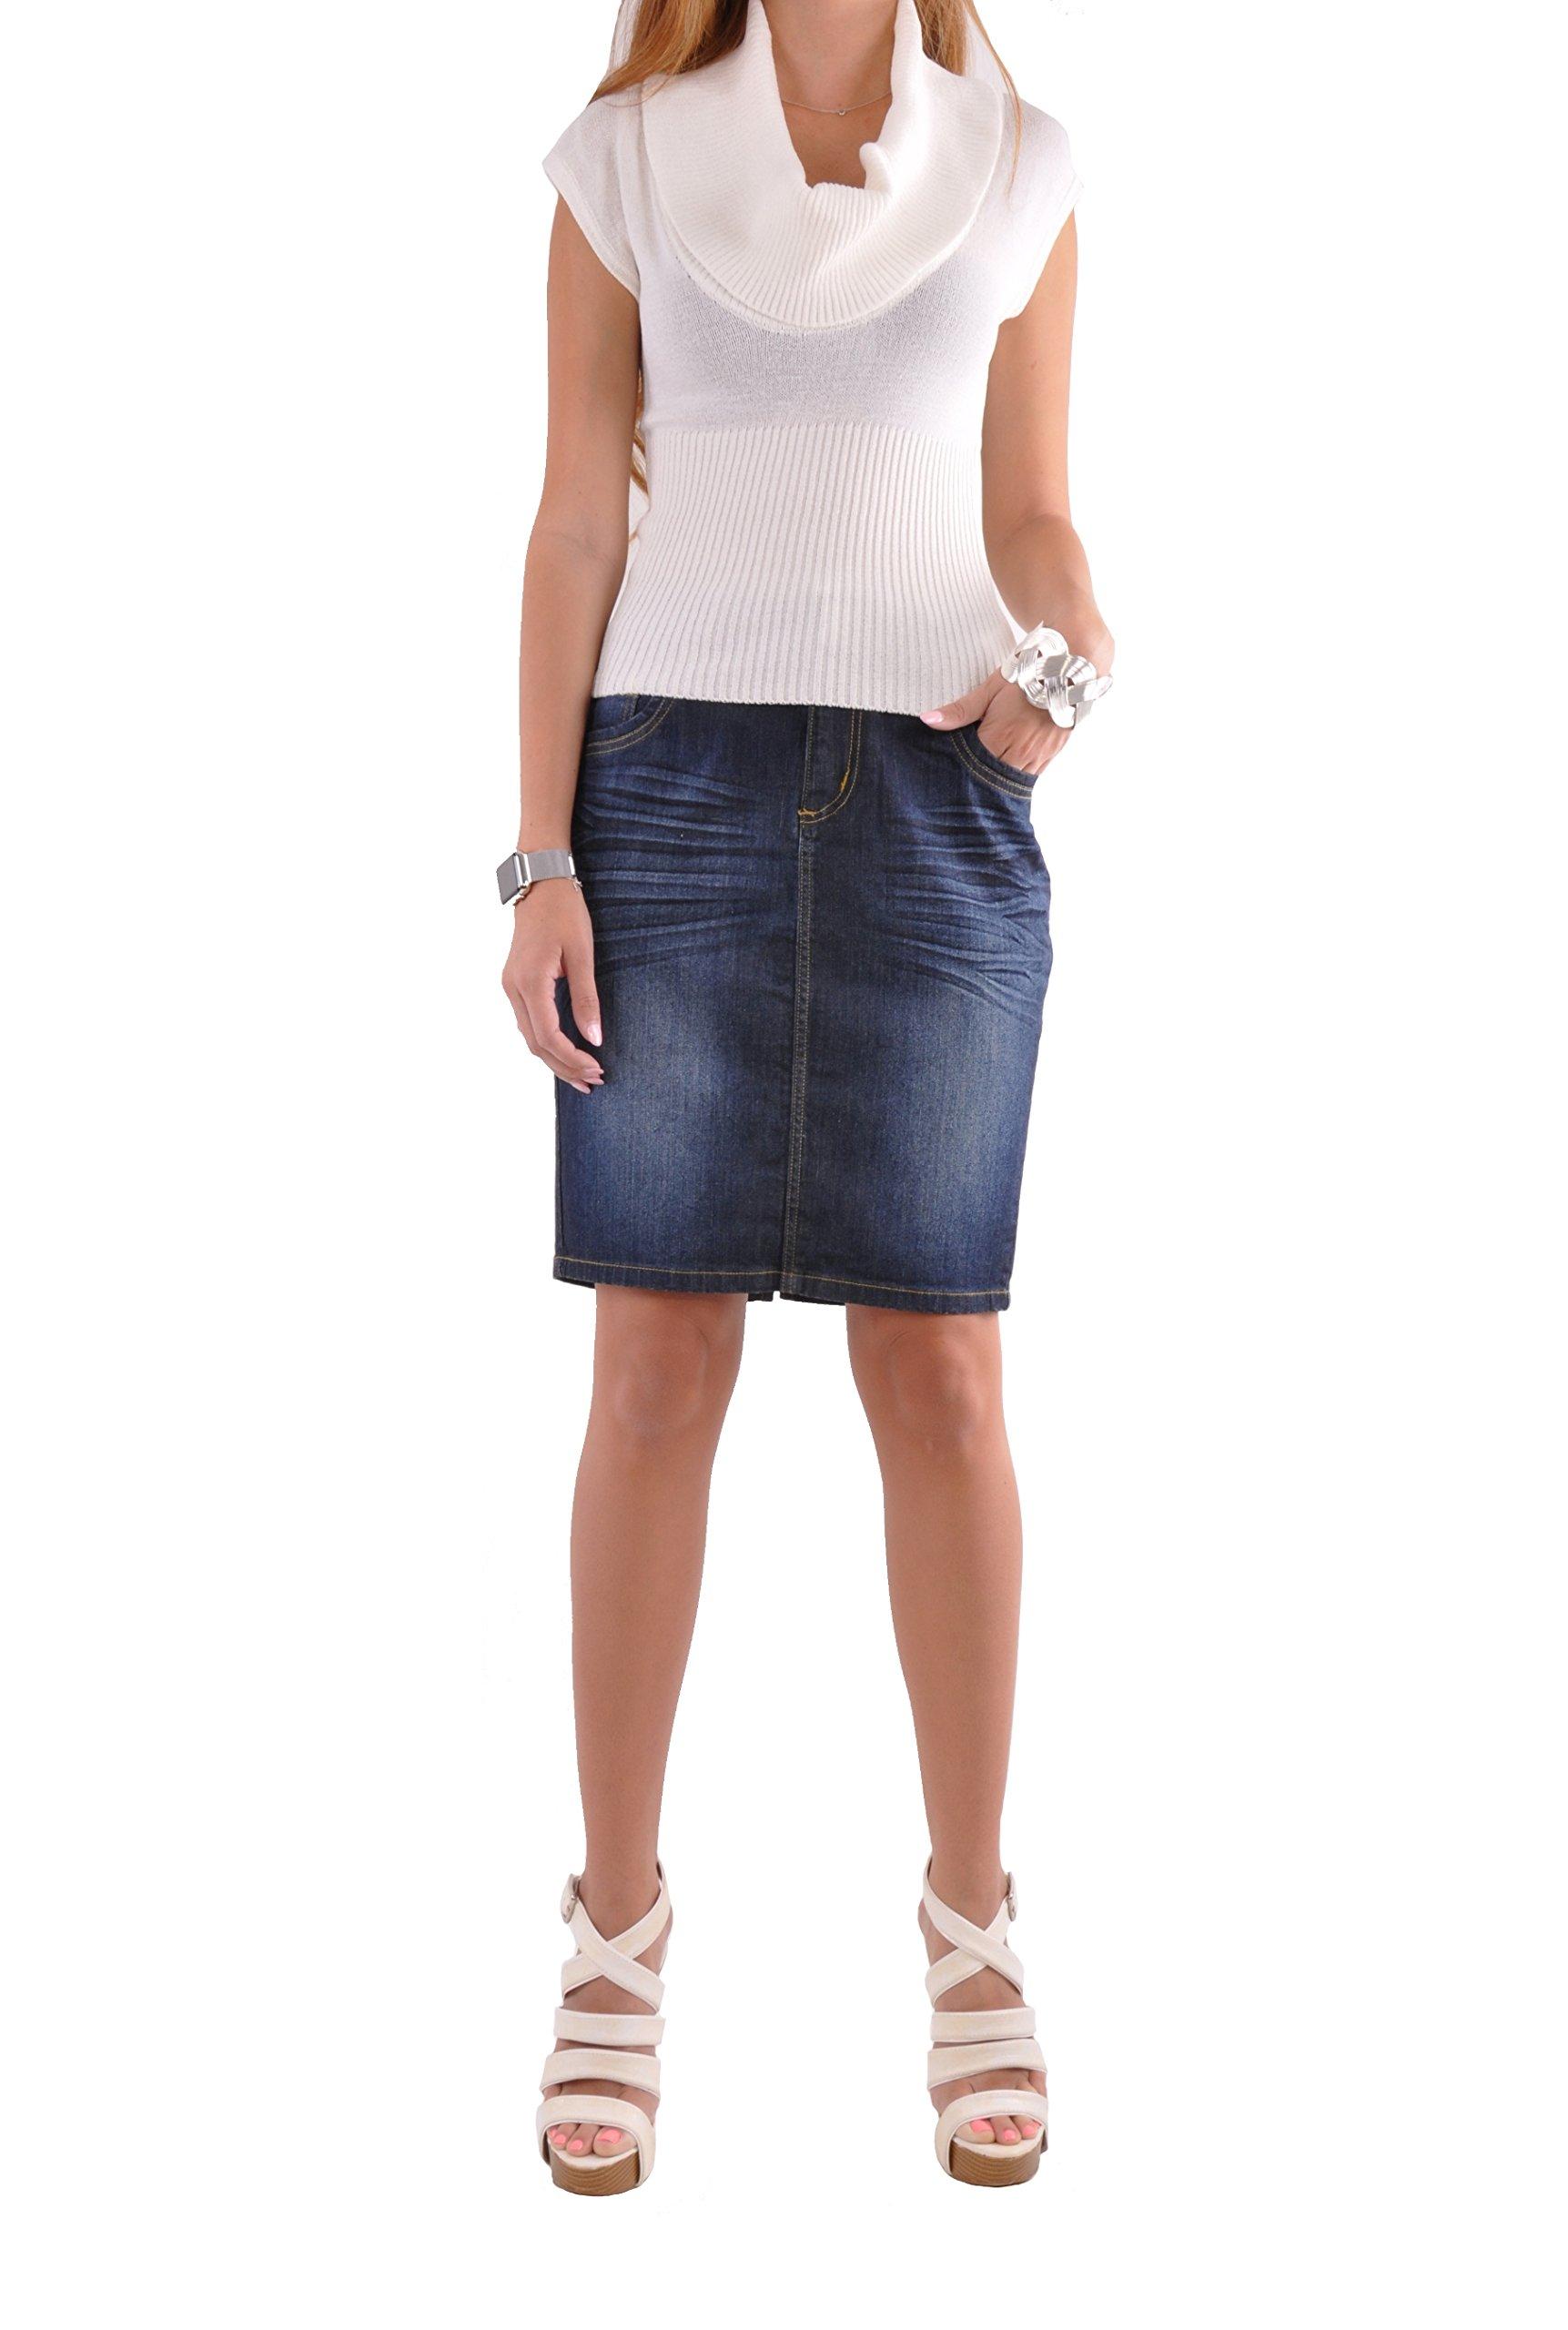 Style J Cute Classy Pencil Skirt-Blue-36(16)